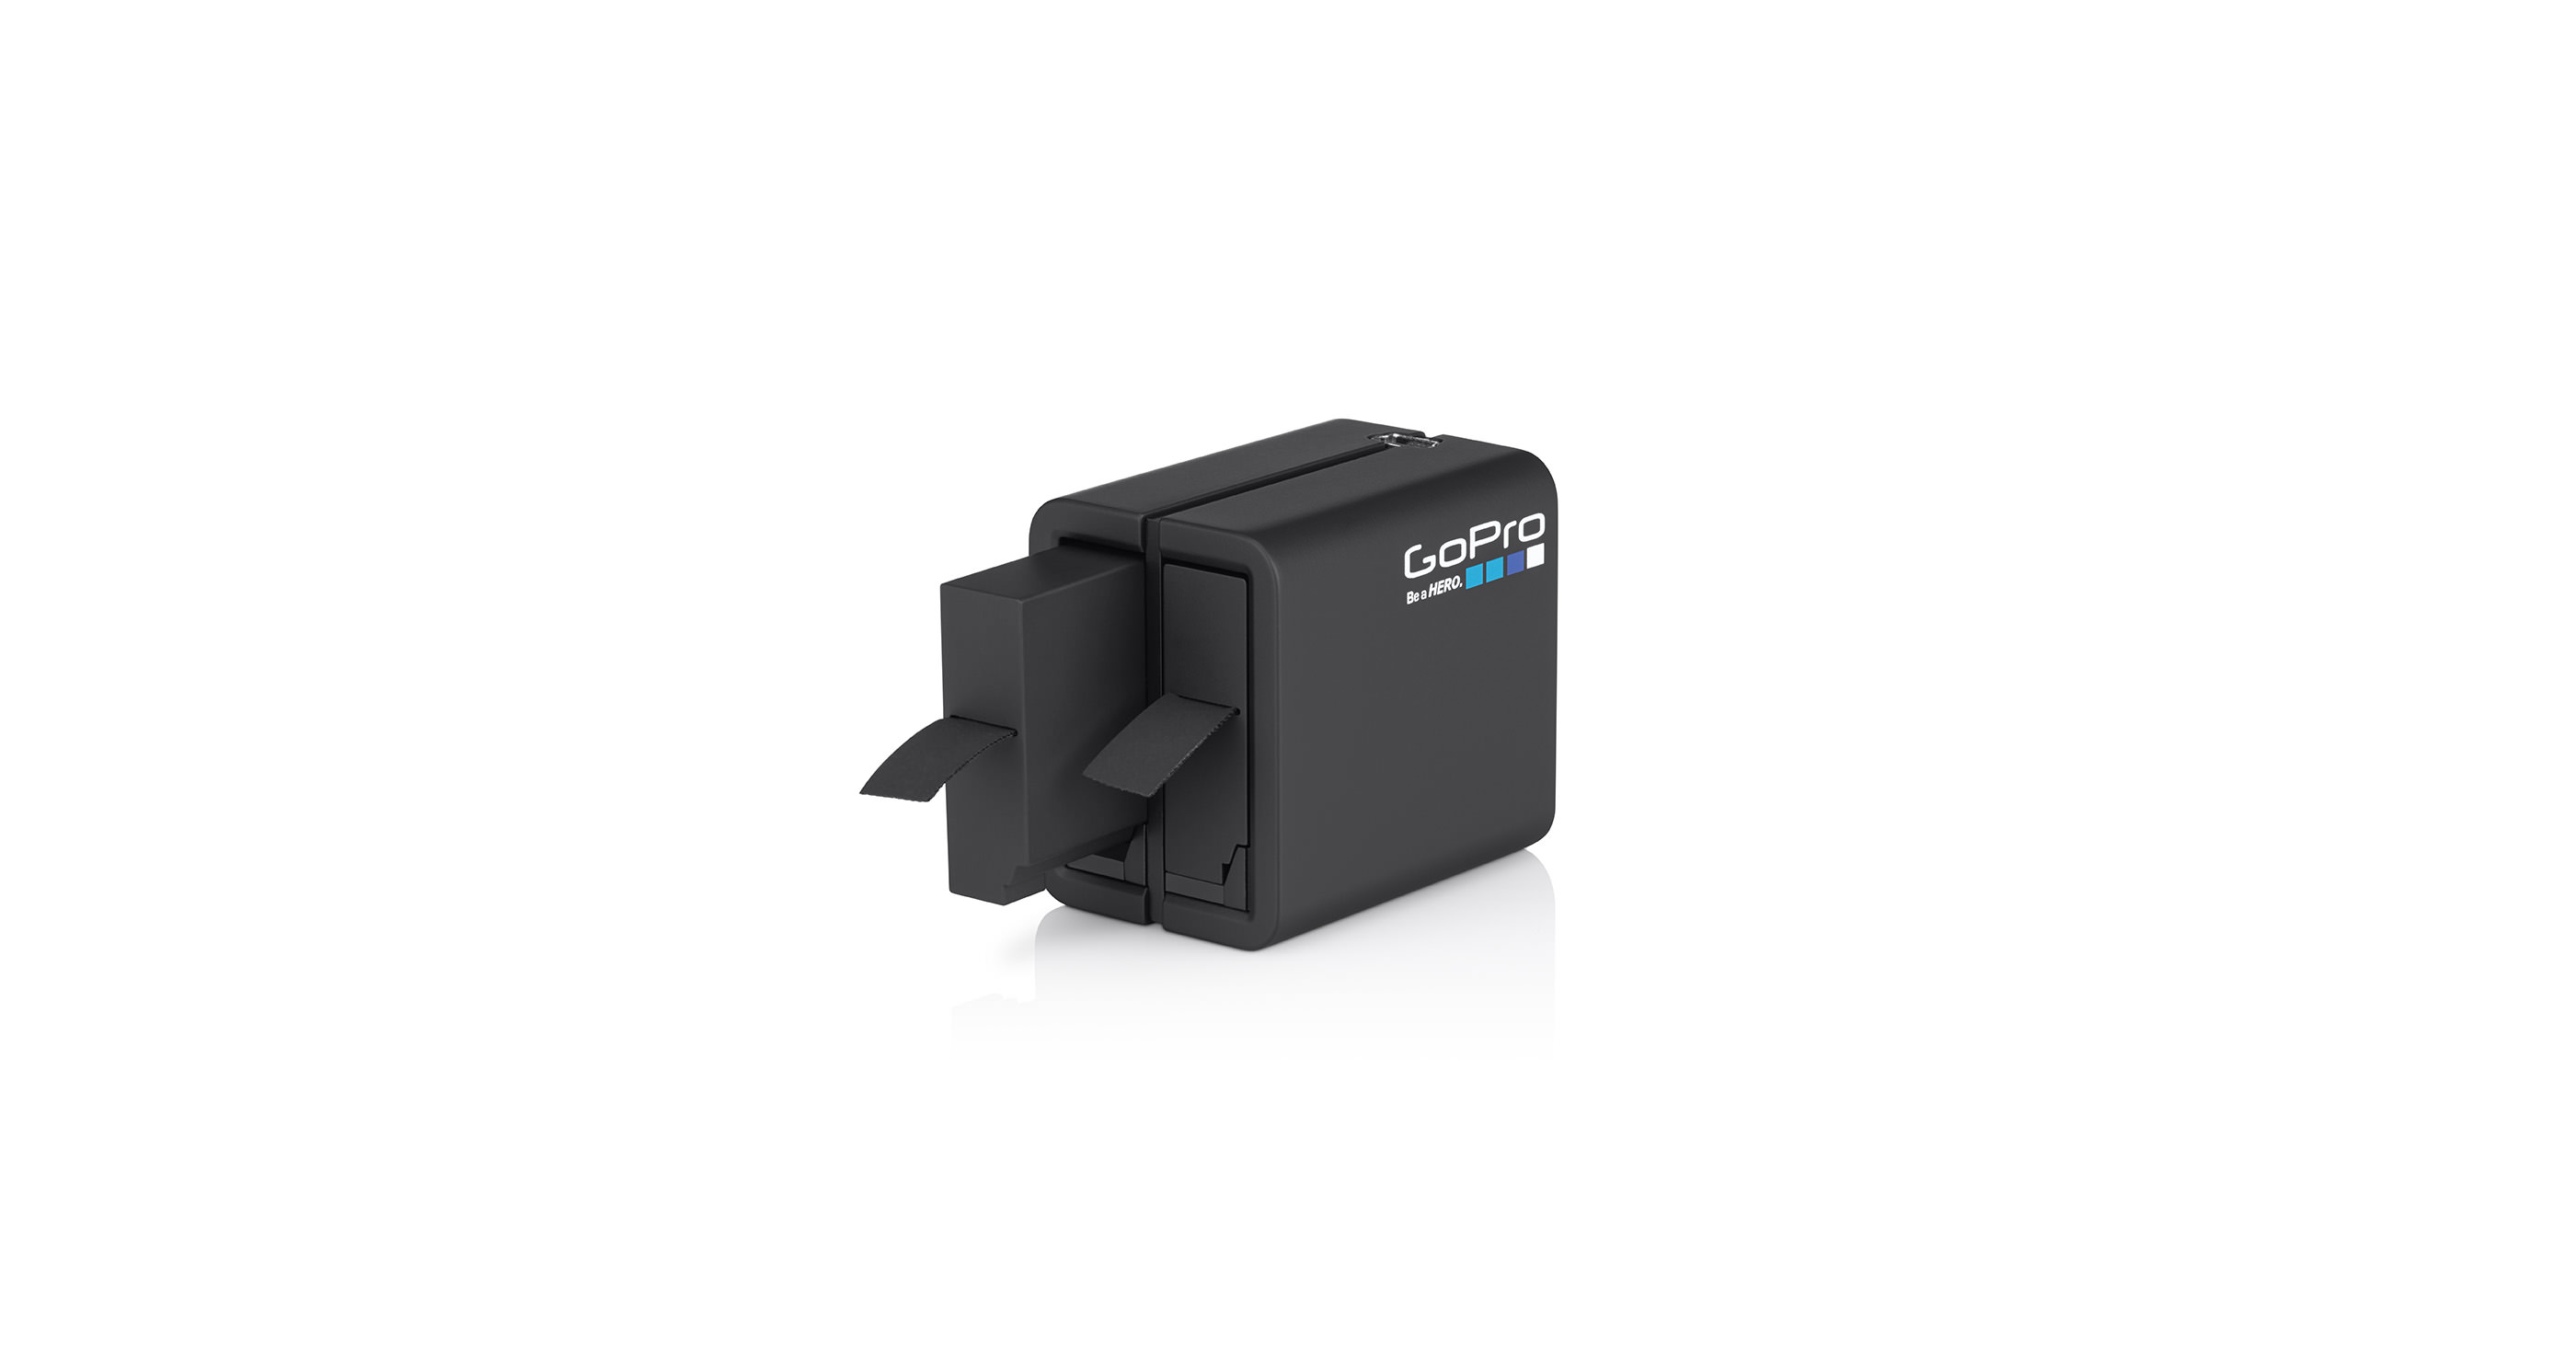 Acumulator GoPro Dual Battery Charger AHBBP-401 pentru HERO4